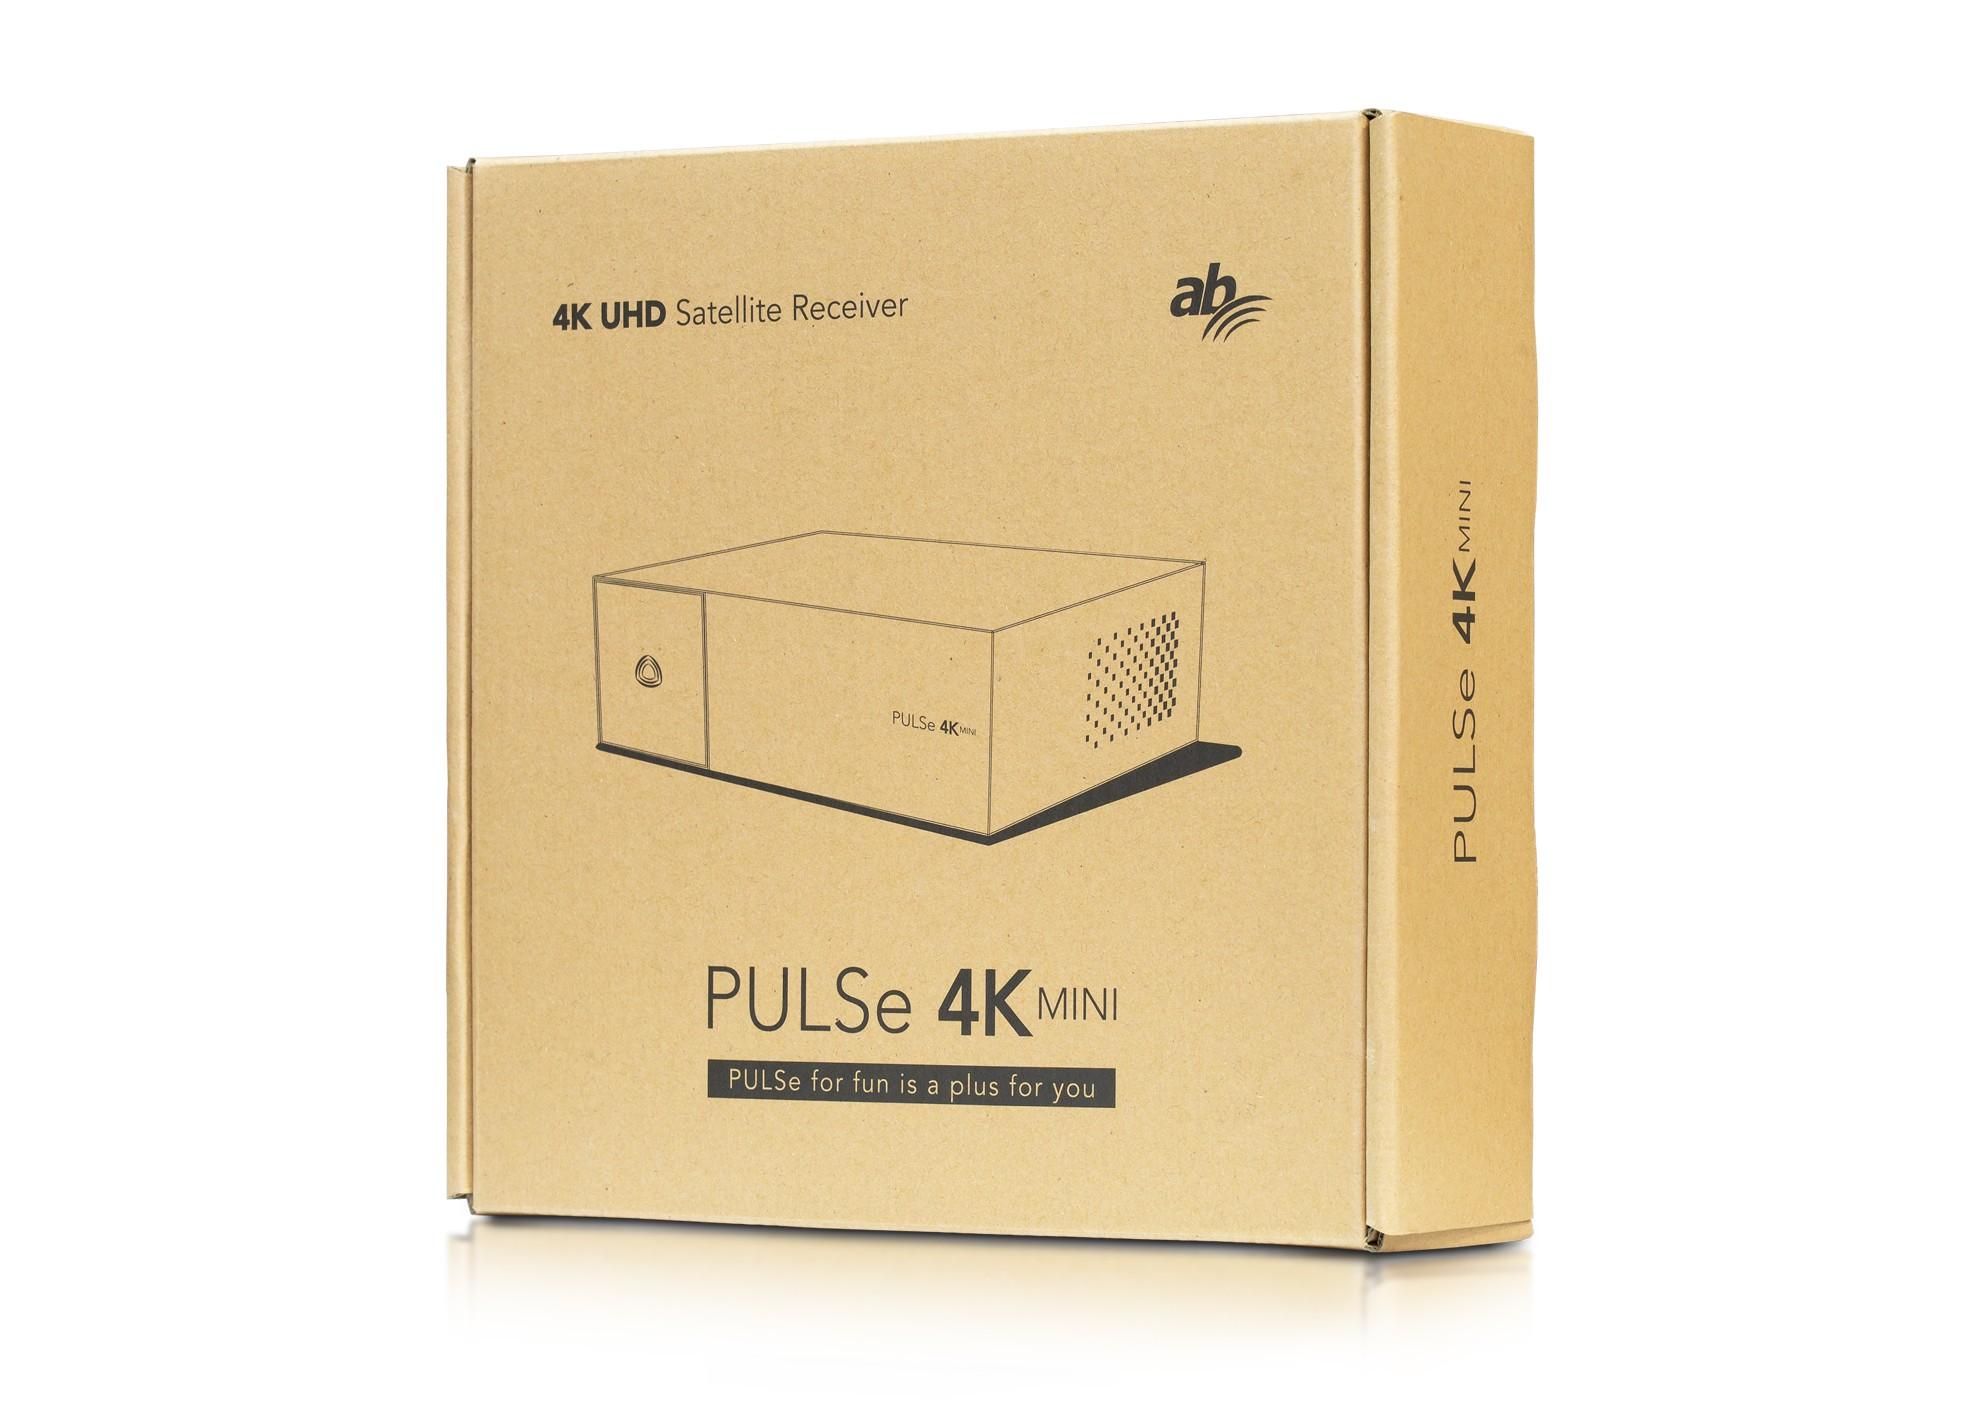 AB PULSe 4K MINI (1x tuner DVB-S2X + 64GB MicroSD)